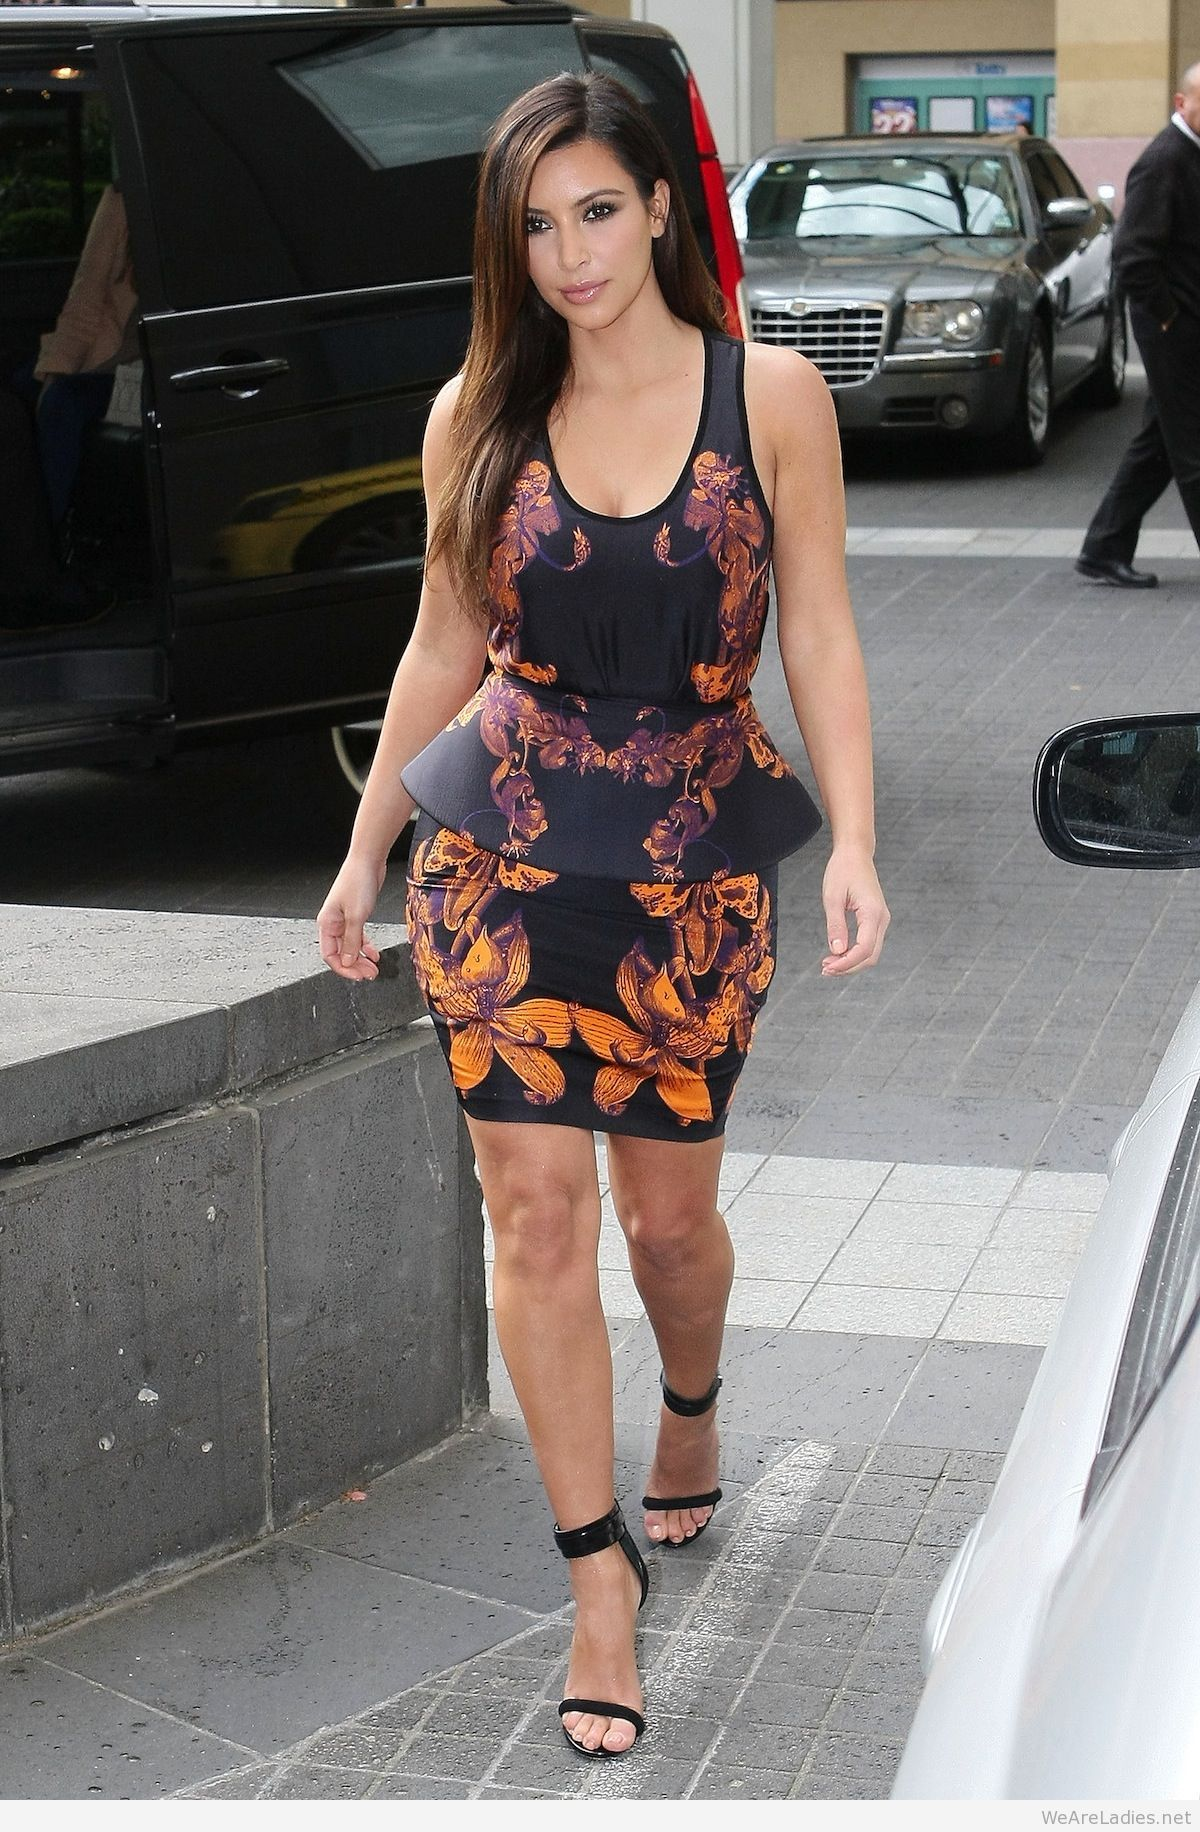 Kardashian Fashion March 2015 Fashion Kim Kardashian Style Trends 2015 Kardashion Disaster